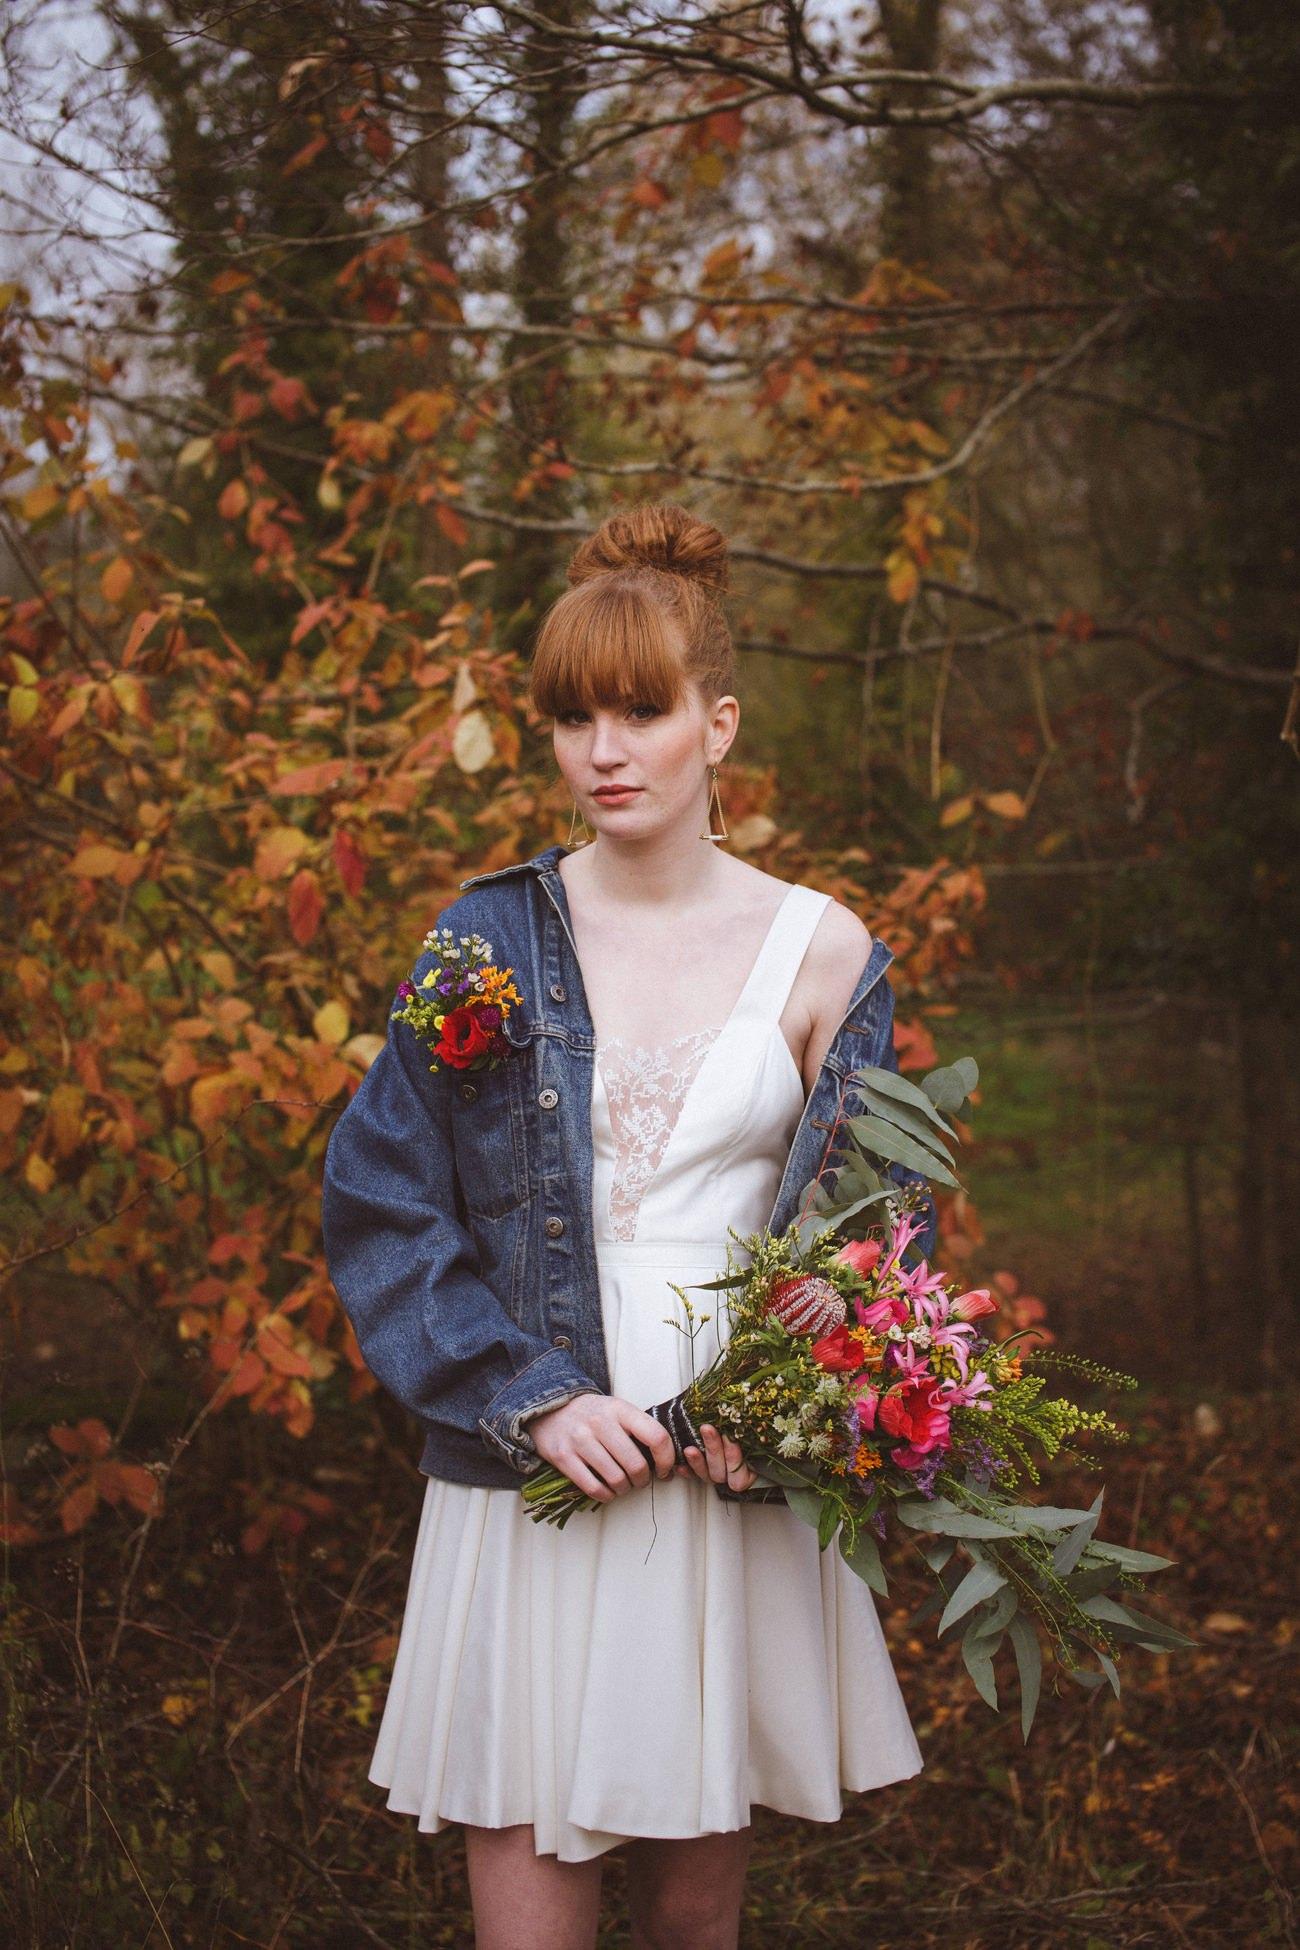 la-femme-gribouillage-reception-mariage-en-plein-air (10).jpg